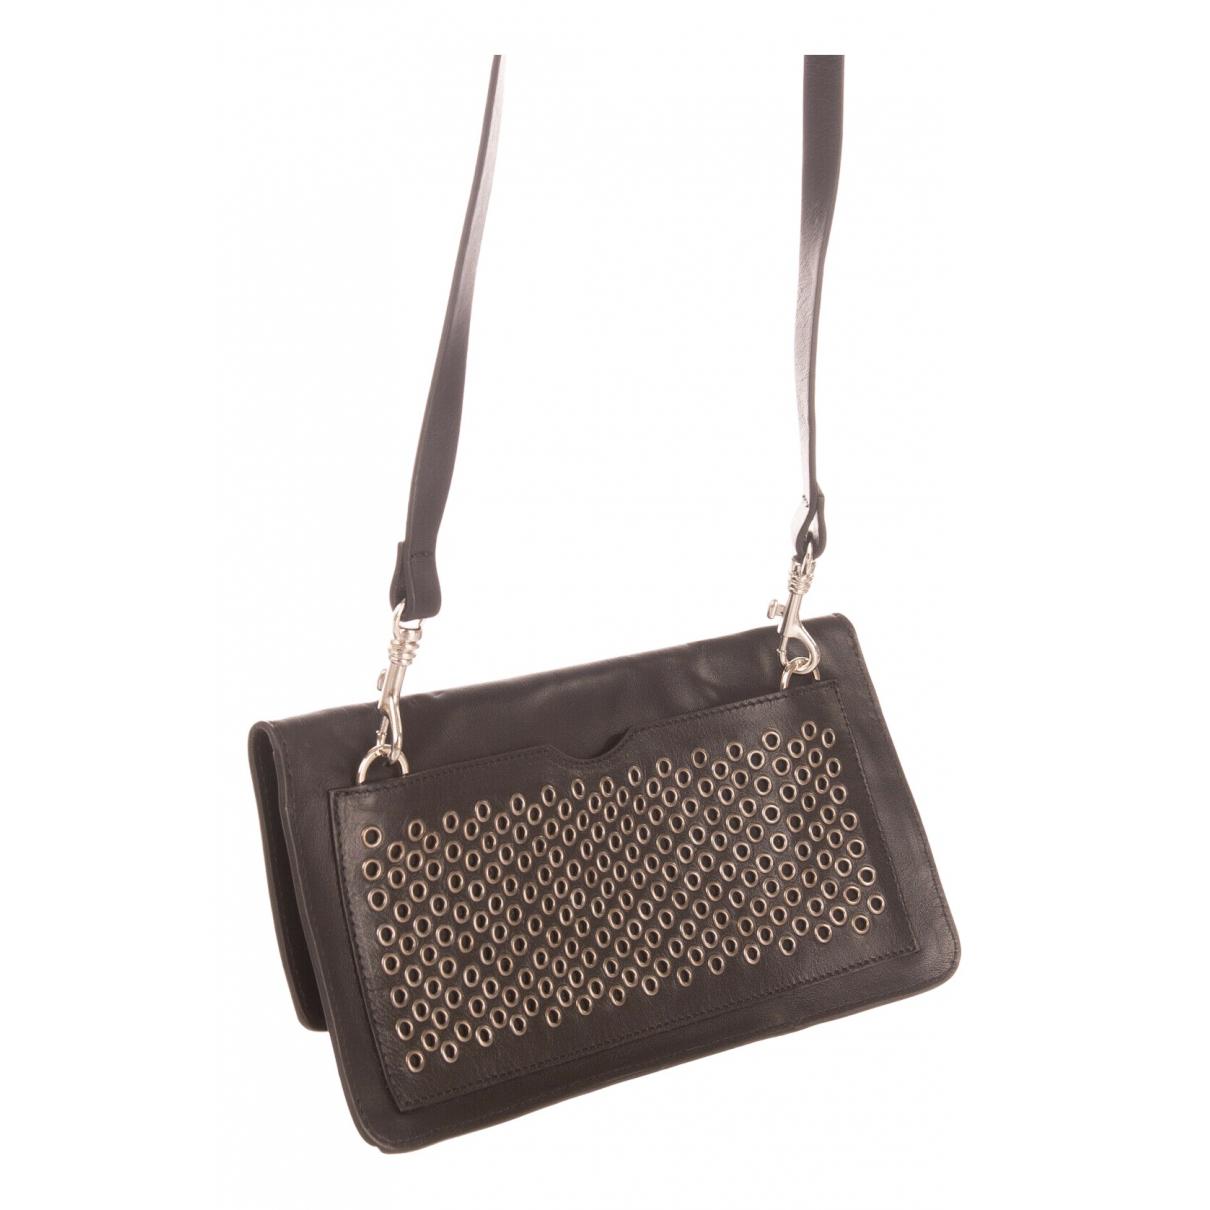 Diesel Black Gold \N Black Leather Clutch bag for Women \N